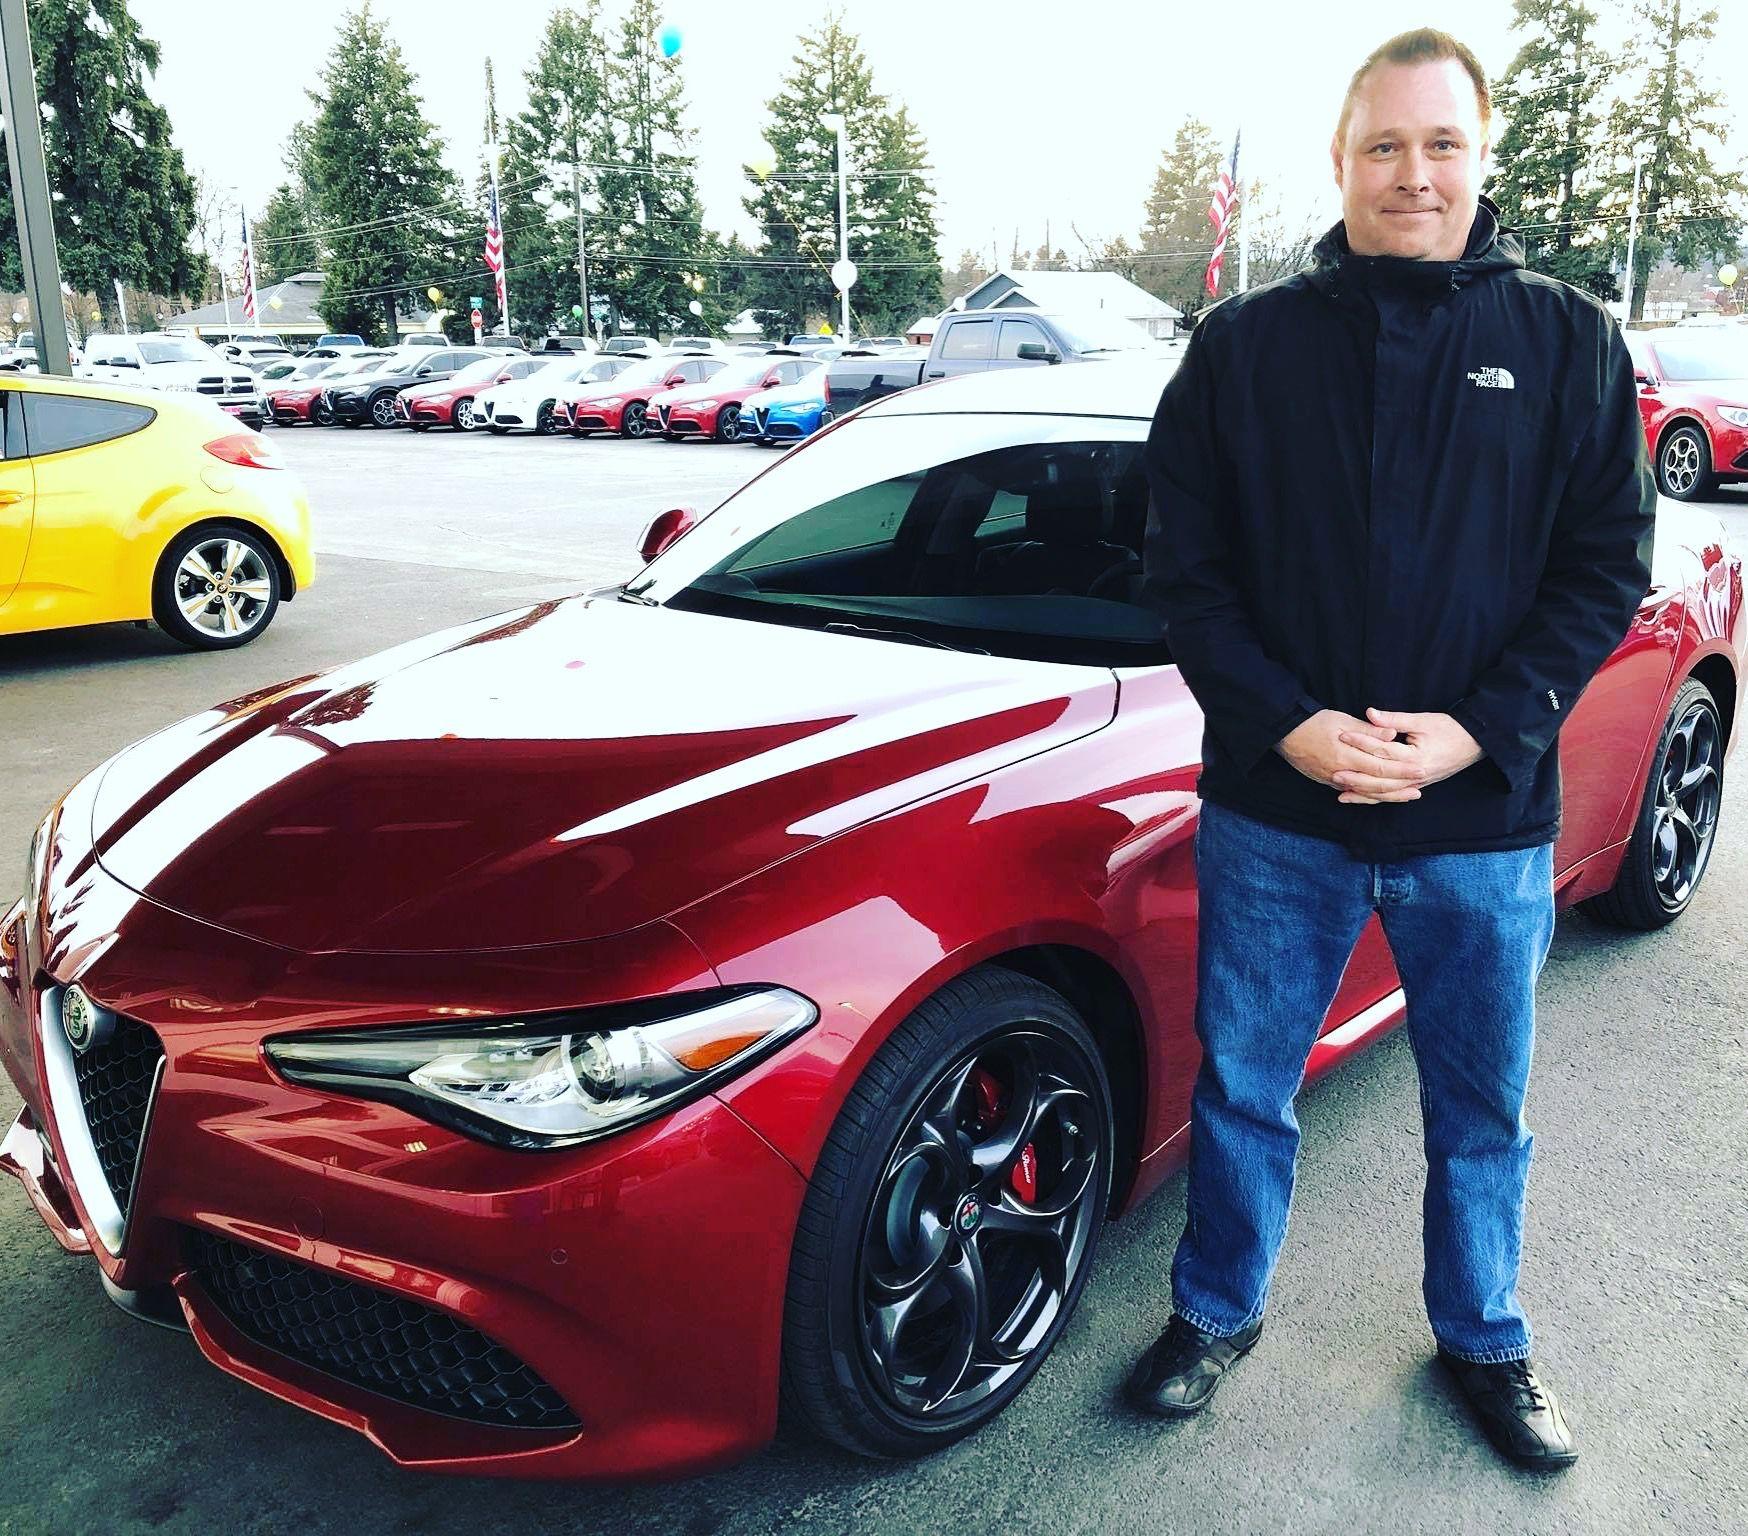 Congratulations To Dave On Your New Alfa Romeo Giulia Ti Sport All The Way From Tenino Washington 6 Hour Drive Alfa Romeo Giulia Lease Specials Alfa Romeo